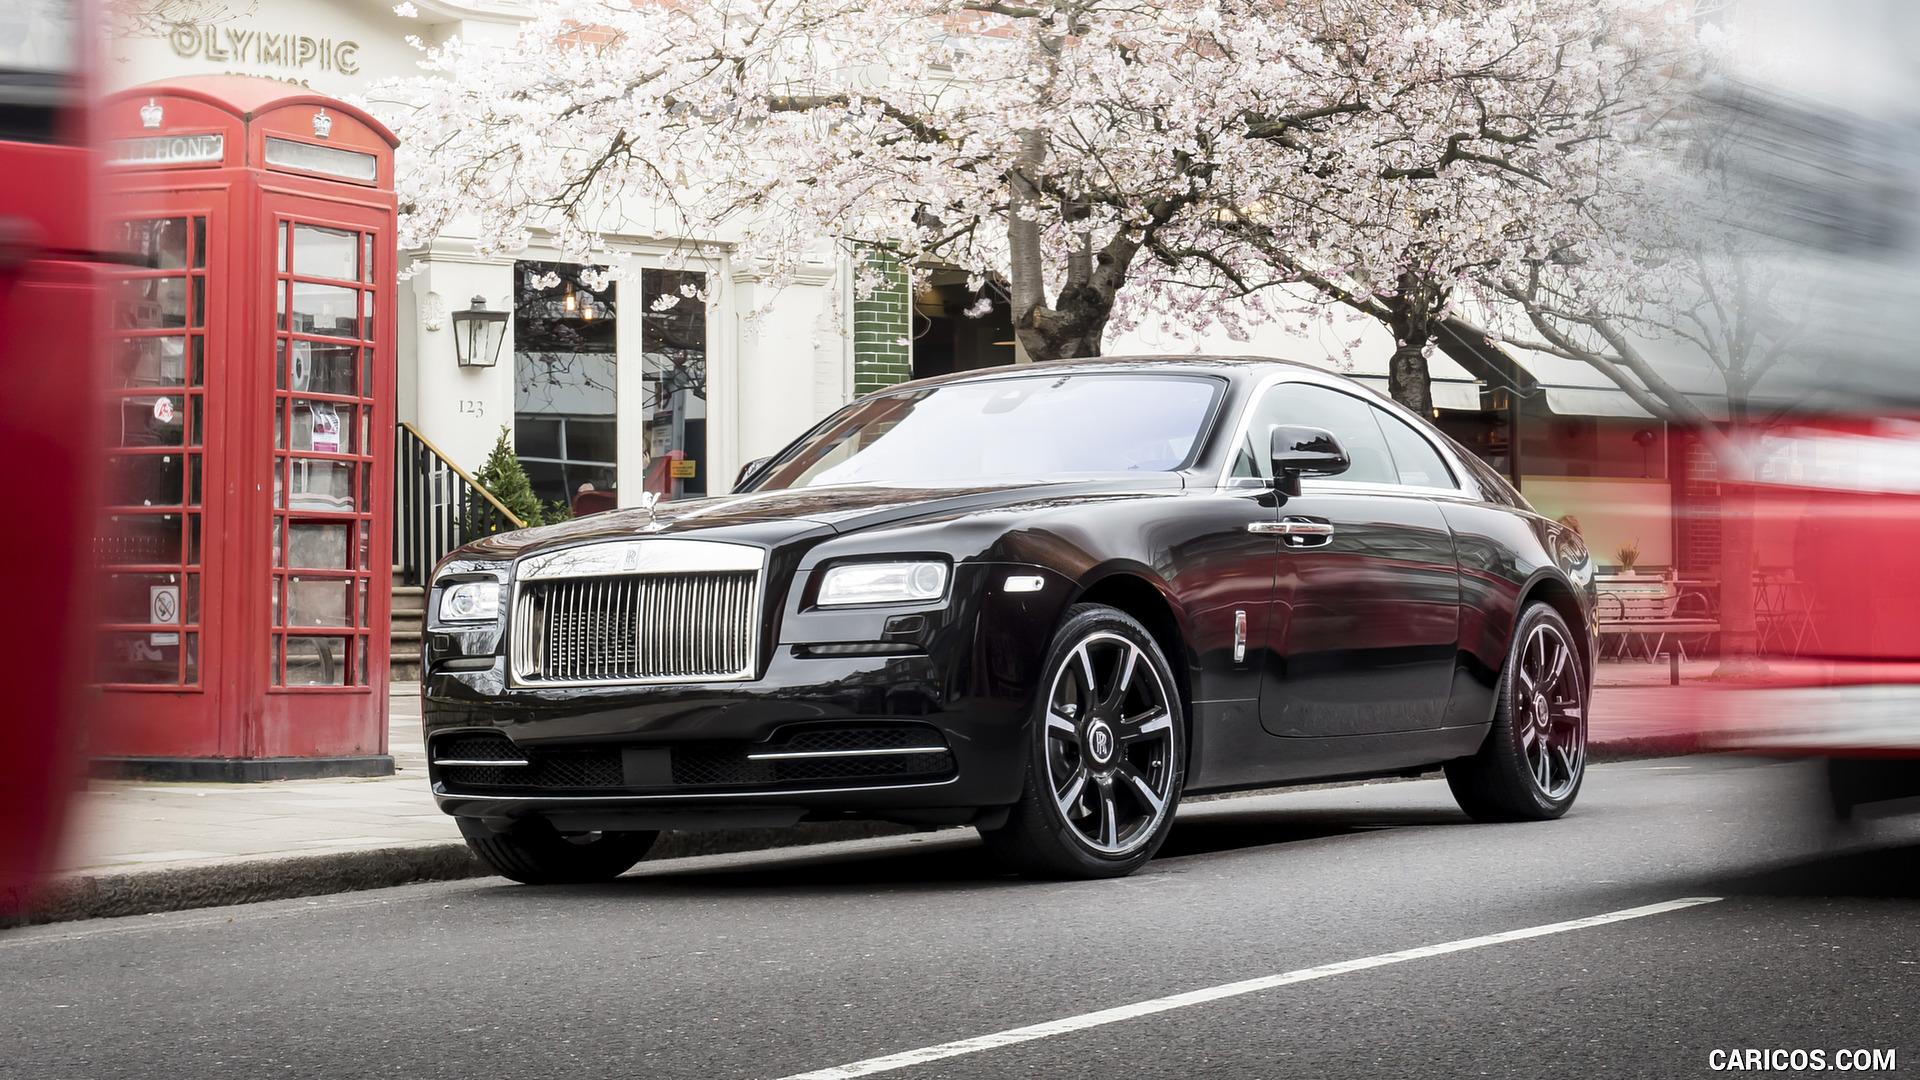 2017 Rolls Royce Wraith Inspired by British Music   Ronnie Wood 1920x1080